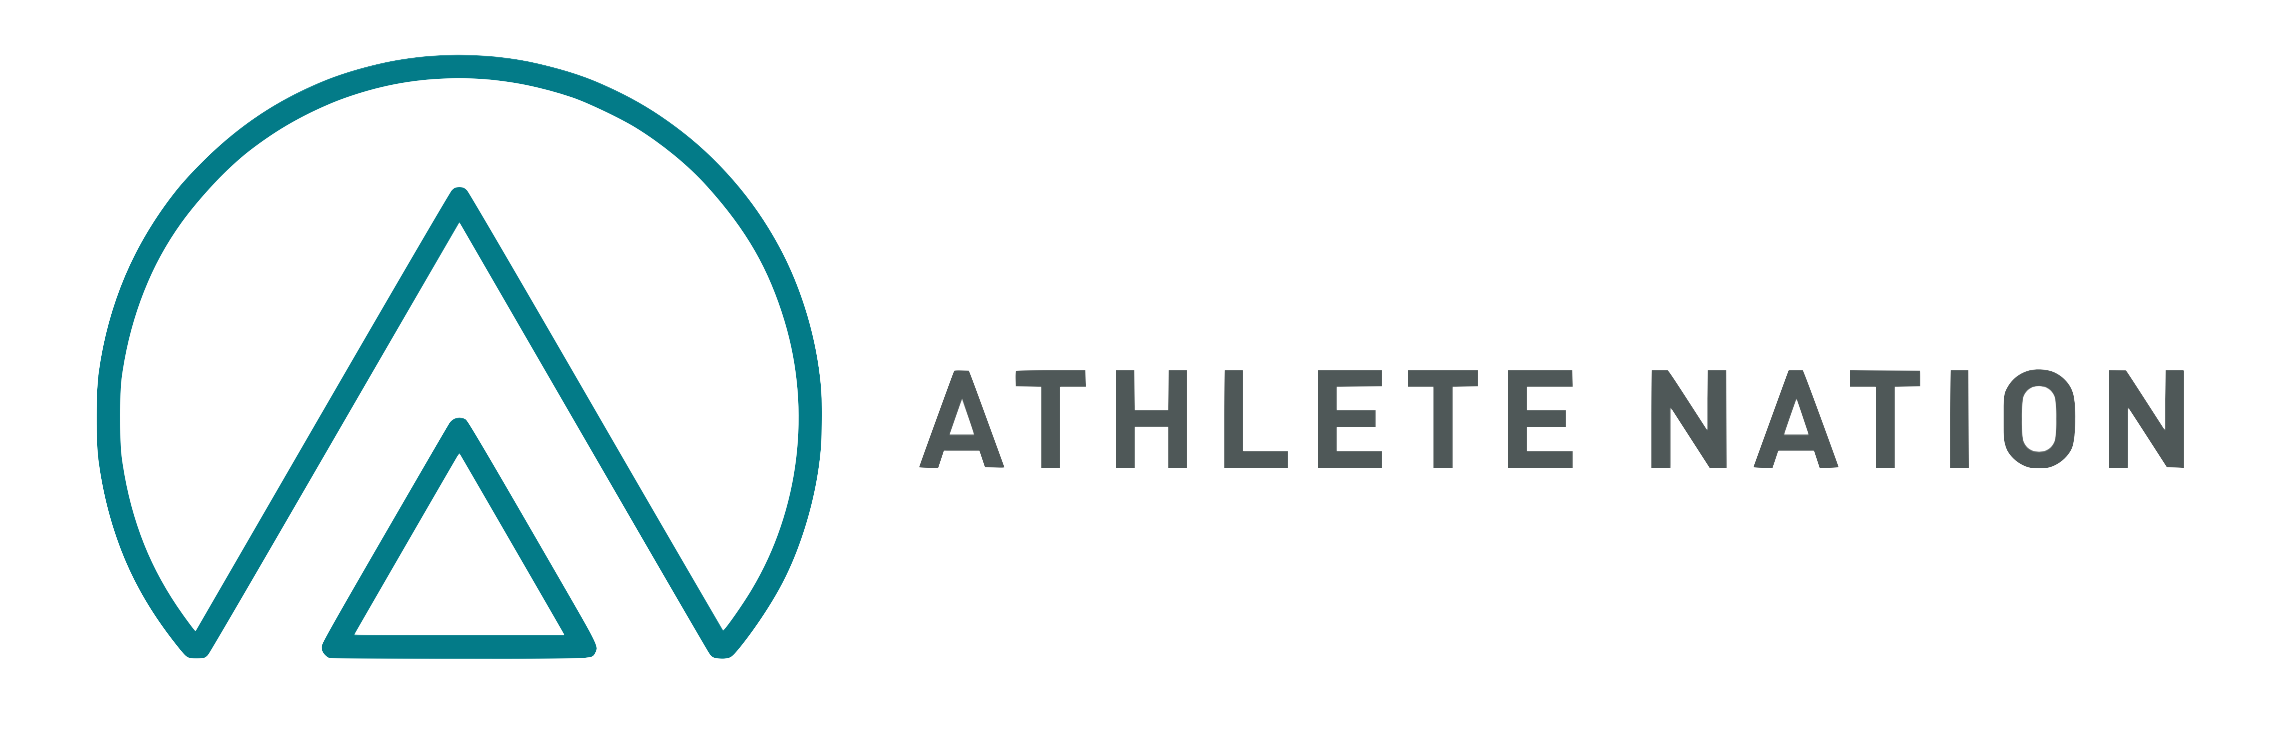 Athlete Nation